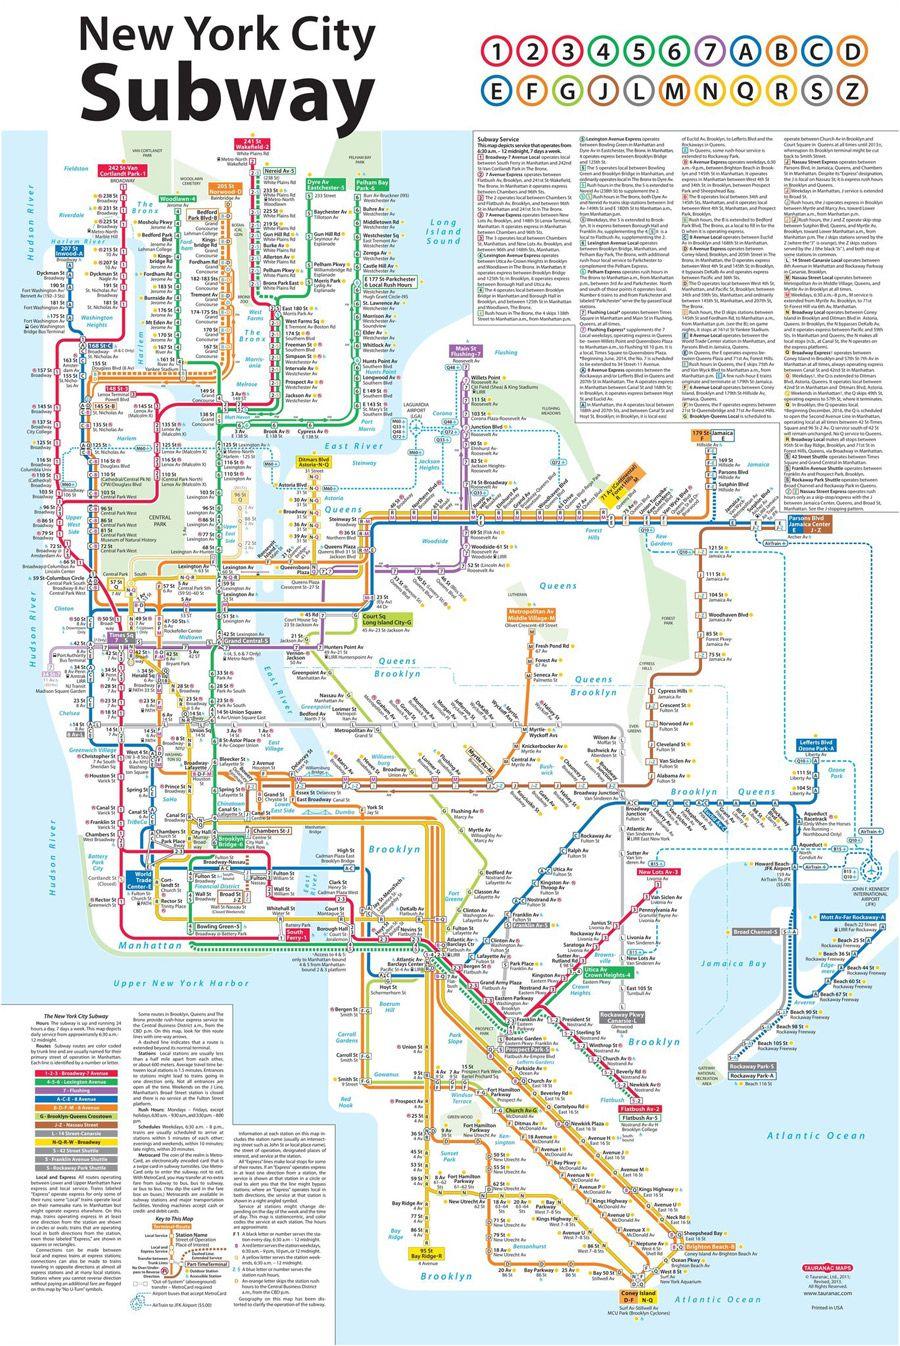 New York City Subway Map Karte Von New York New York City New York